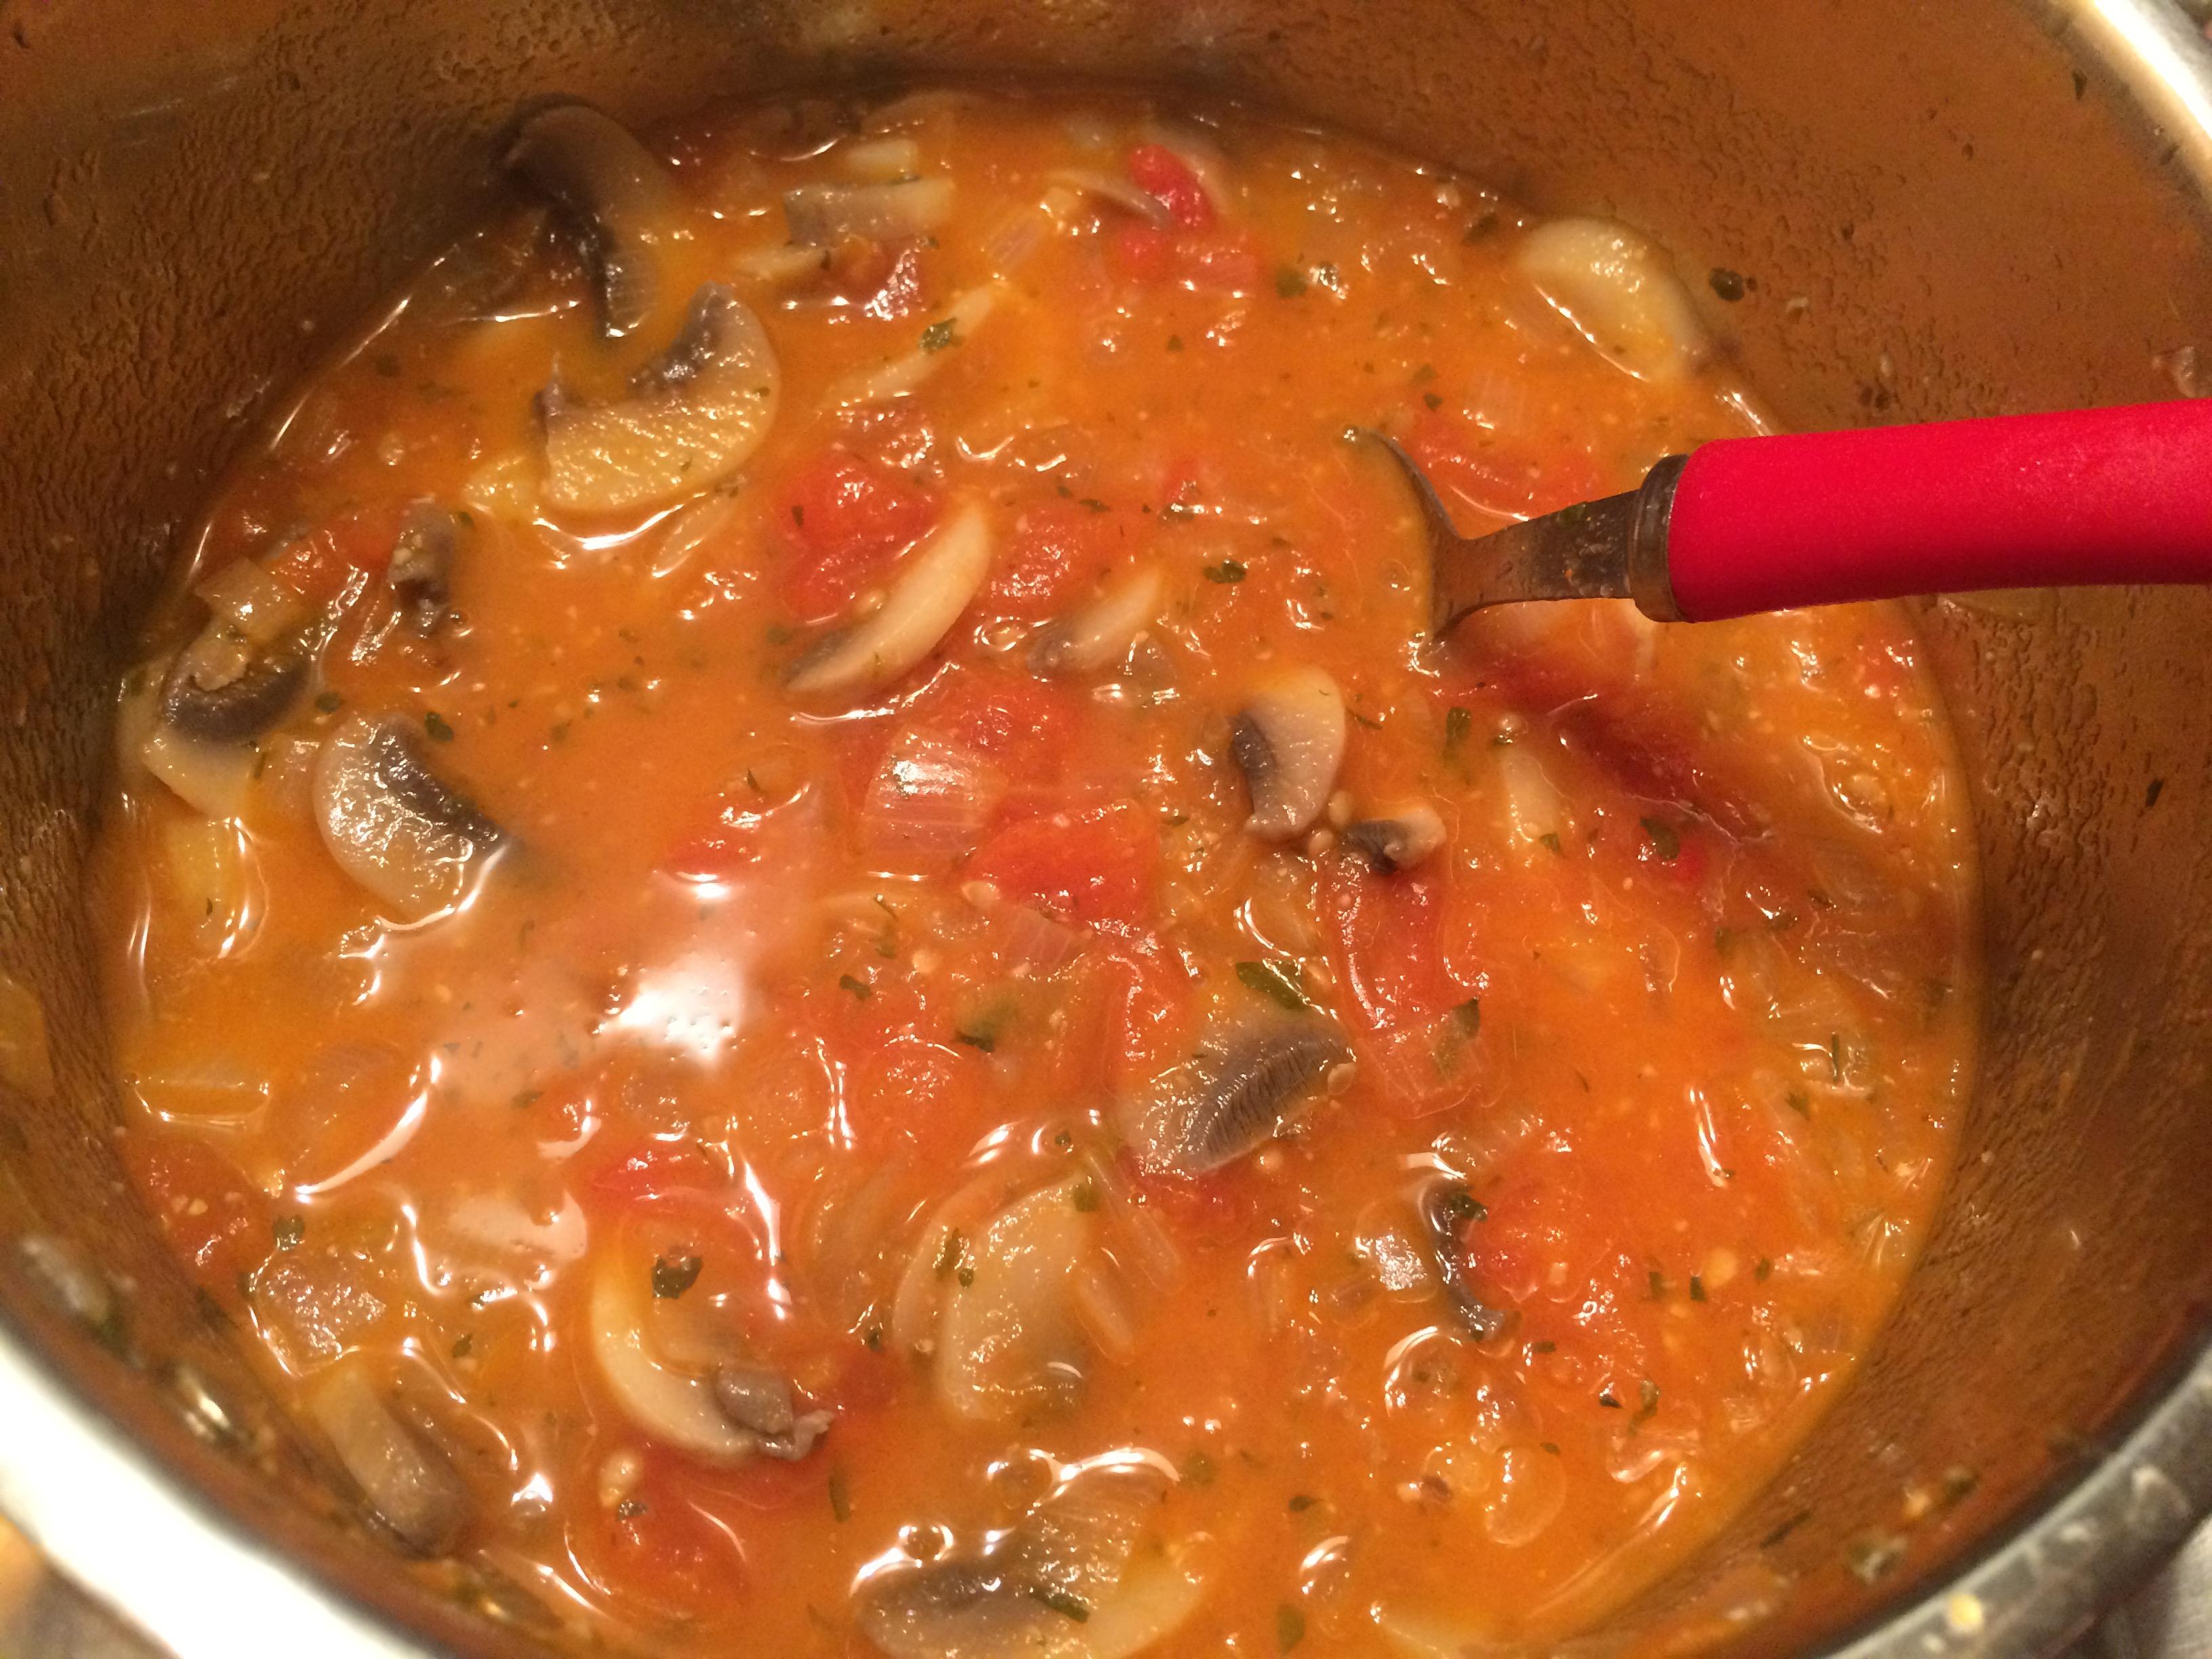 Sauce tomates champignons - SoRoseBonbons